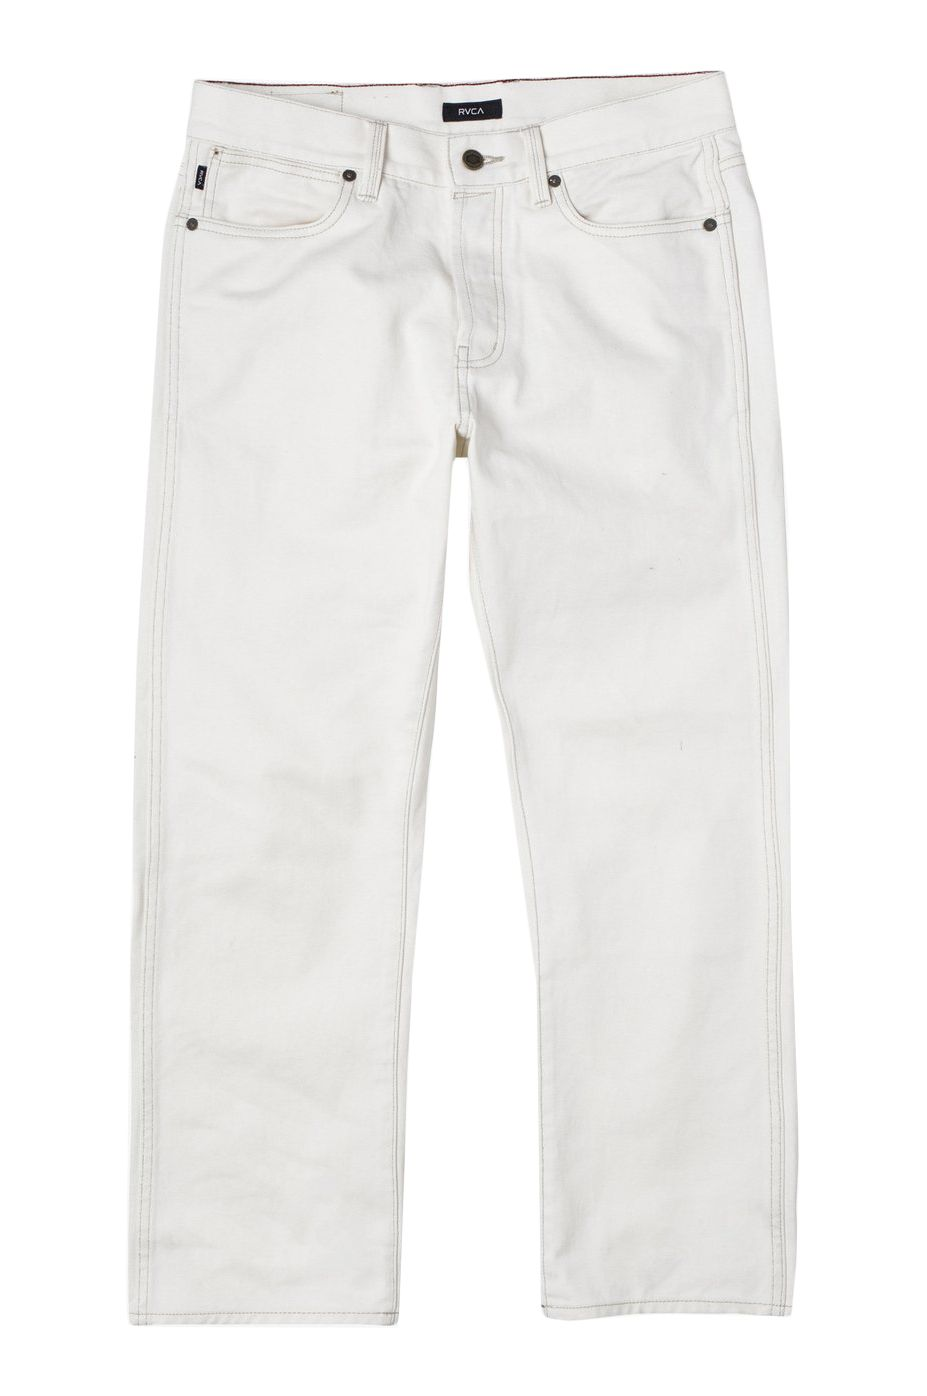 RVCA Pant Jeans NEW DAWN DENIM Off White